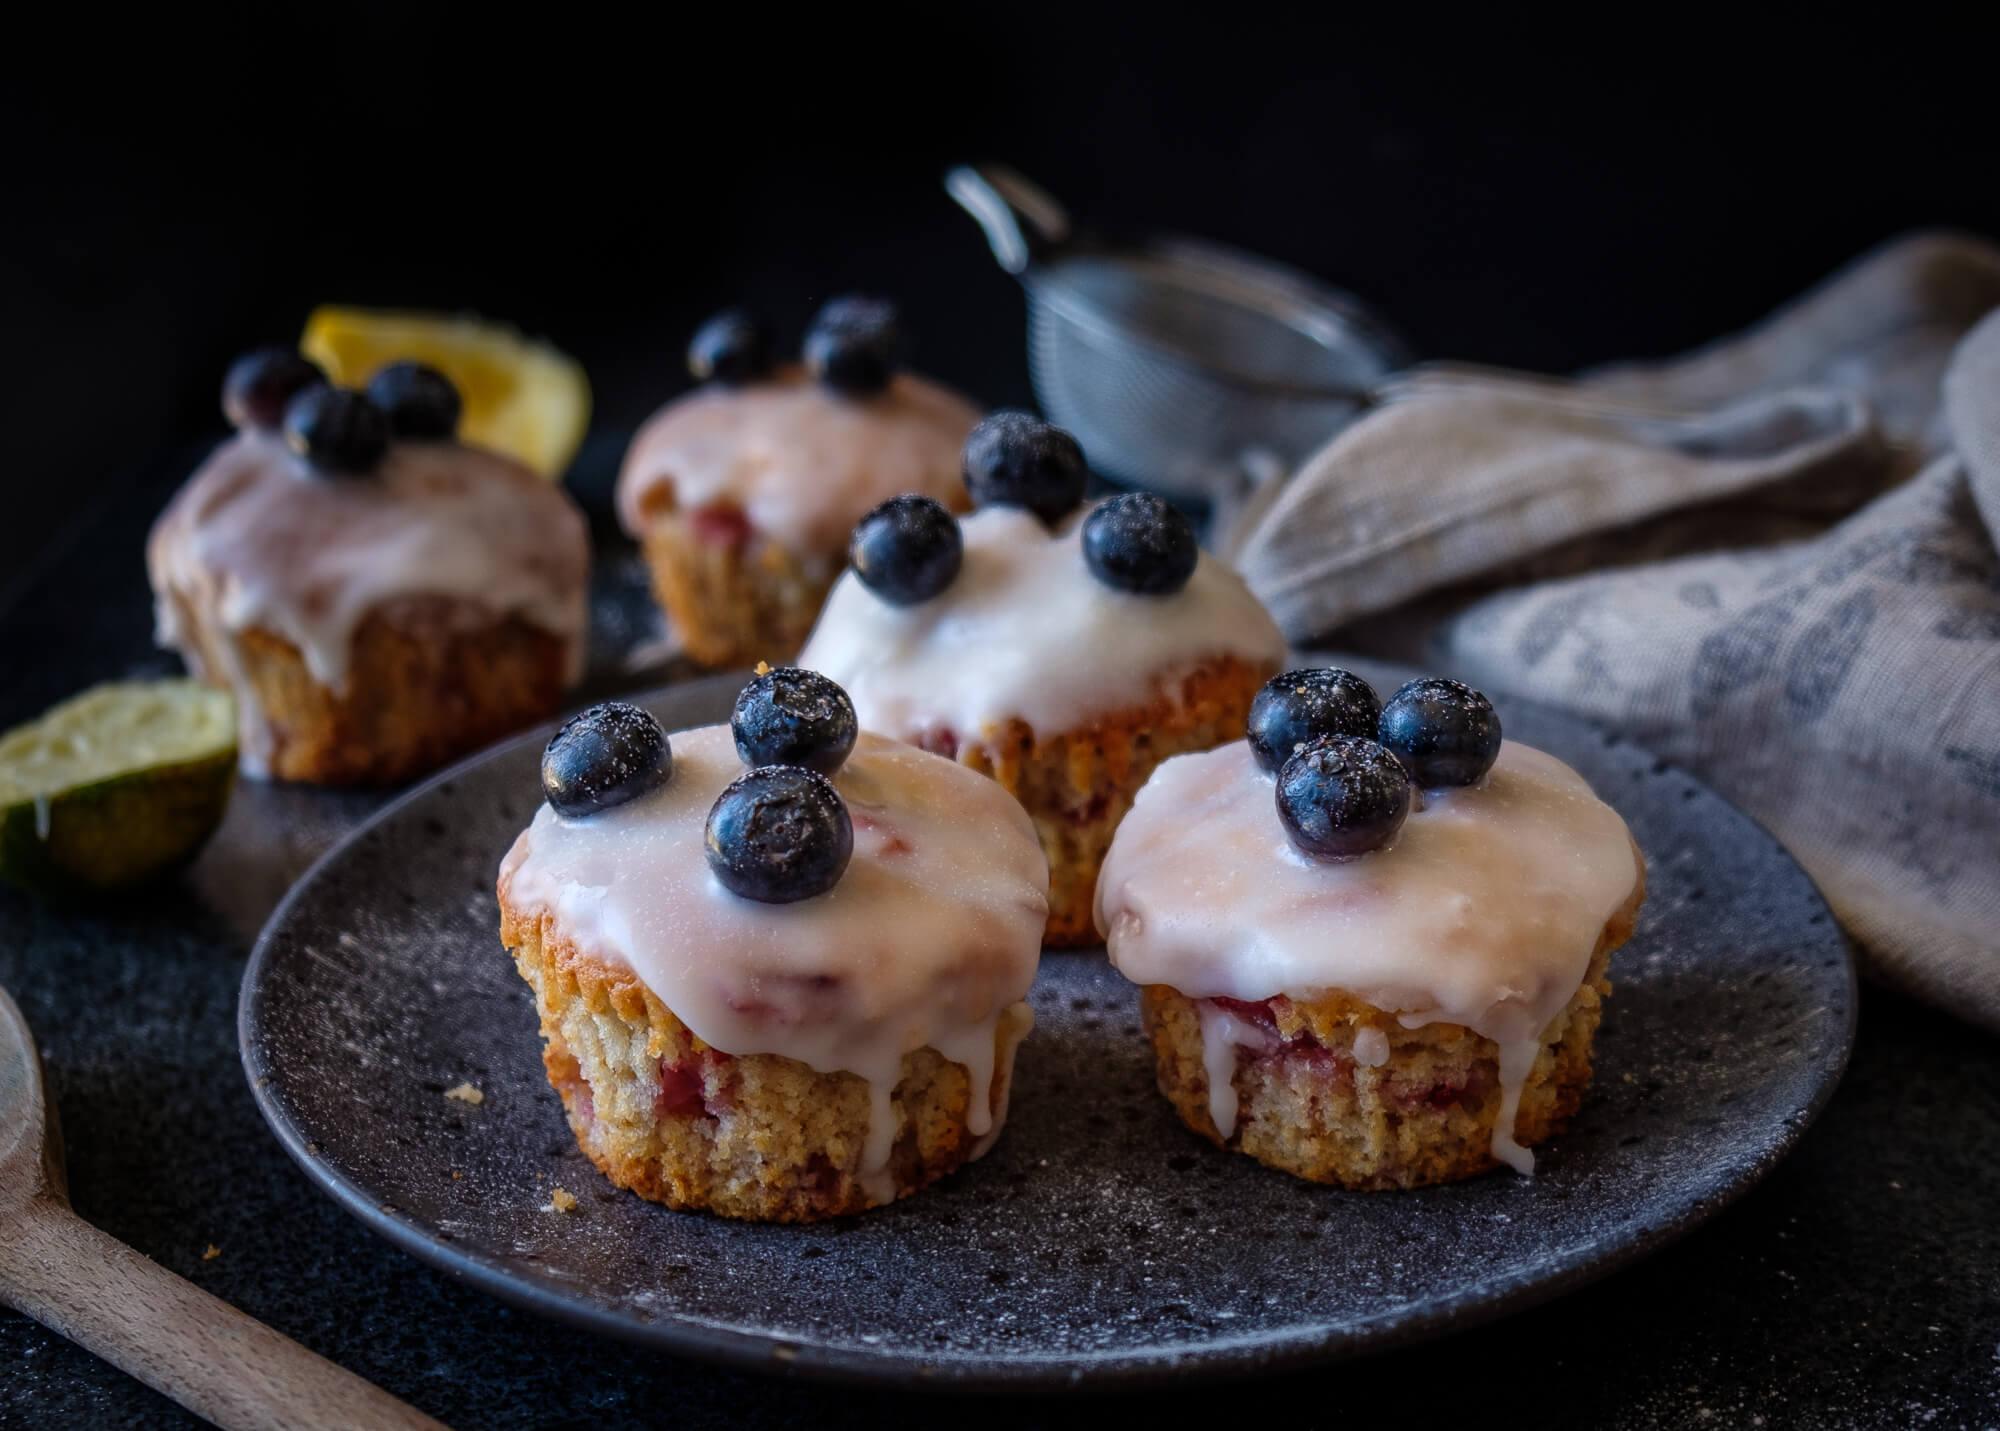 Strawberry & Blueberry Muffins